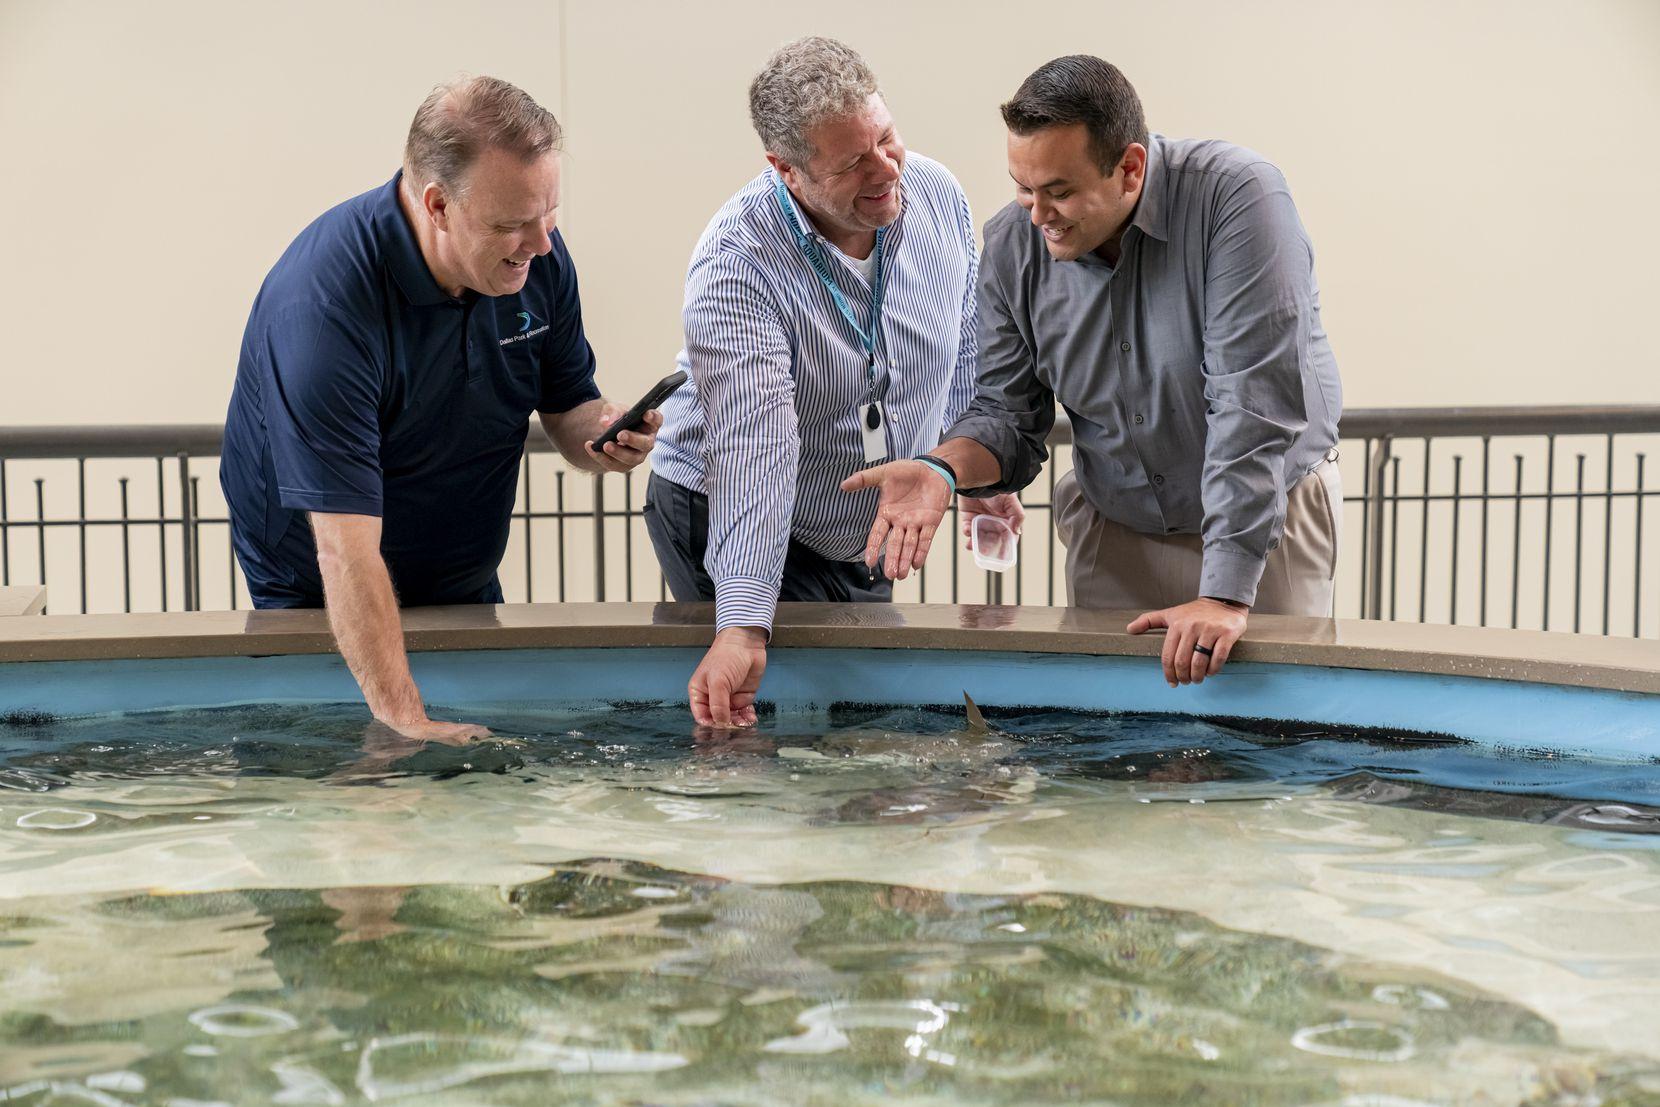 From left, Dallas Park Board member Daniel Wood, zoOceanarium Group managing director Chris Davis and Dallas City Council member Adam Bazaldua touch stingrays during a tour of the St. Louis Aquarium at Union Station on Wednesday.